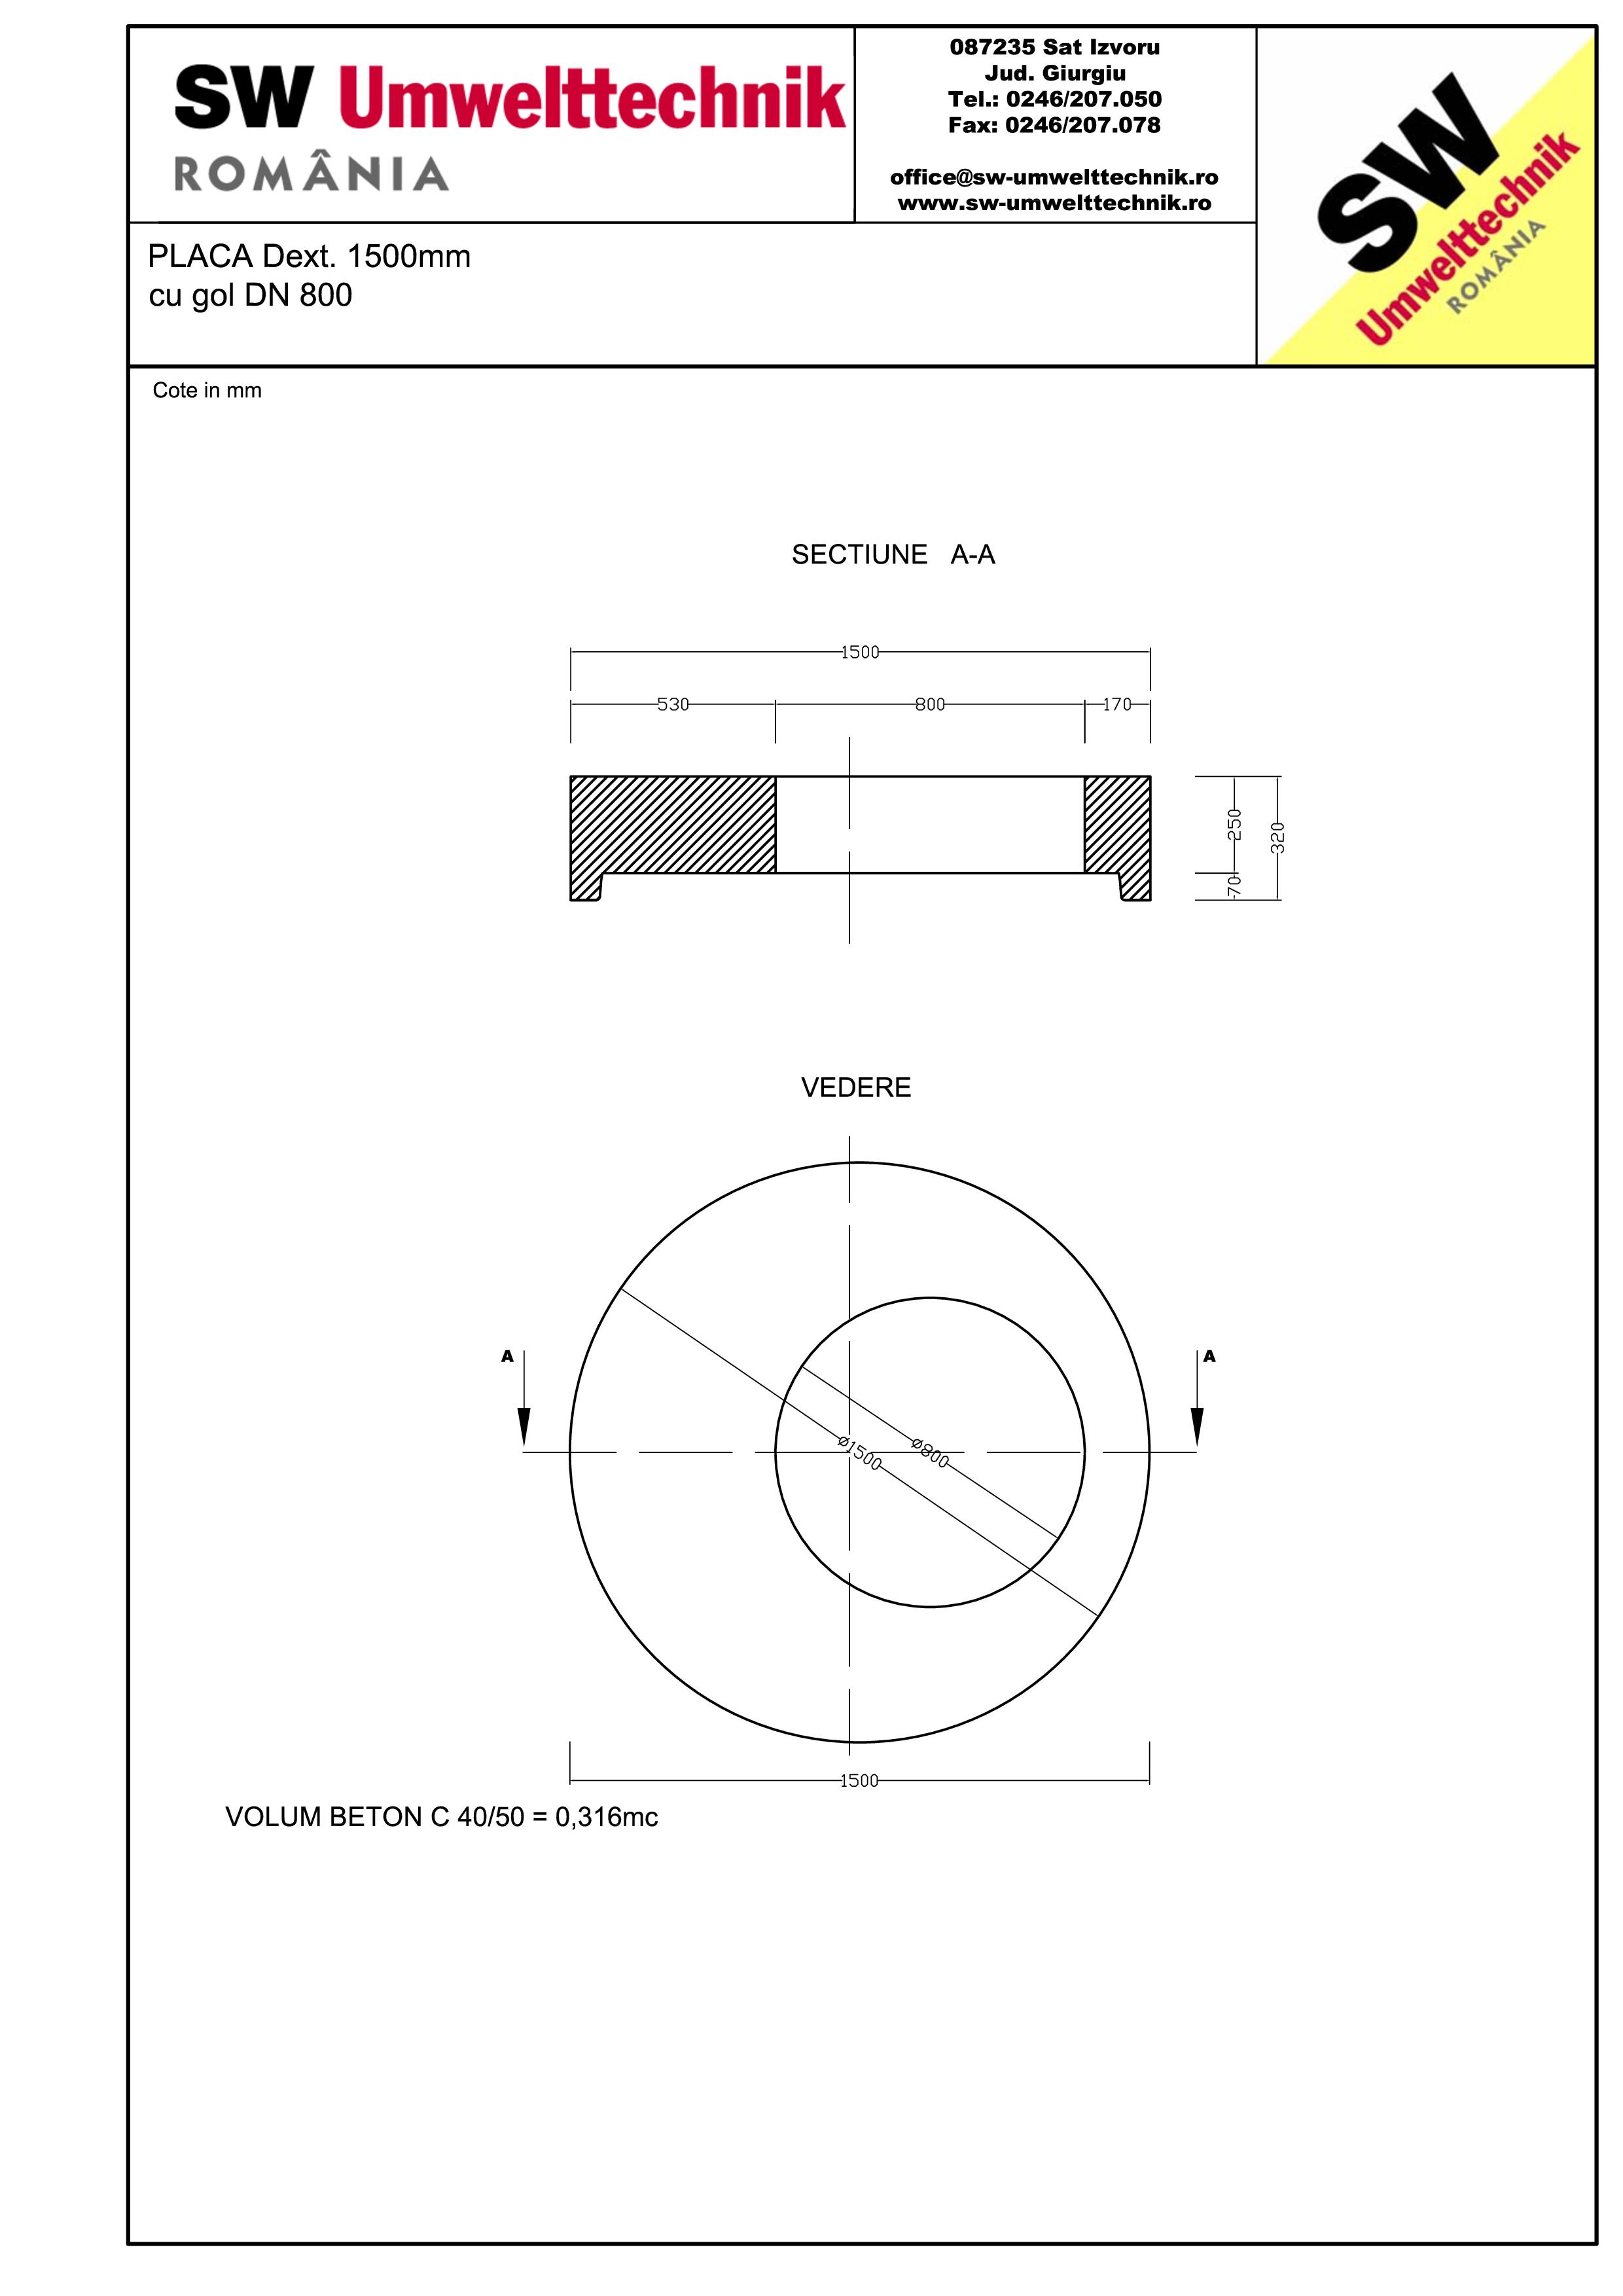 Pagina 1 - CAD-PDF Placa Dext.1500 H250 cu golL DN 800 SW UMWELTTECHNIK Detaliu de produs